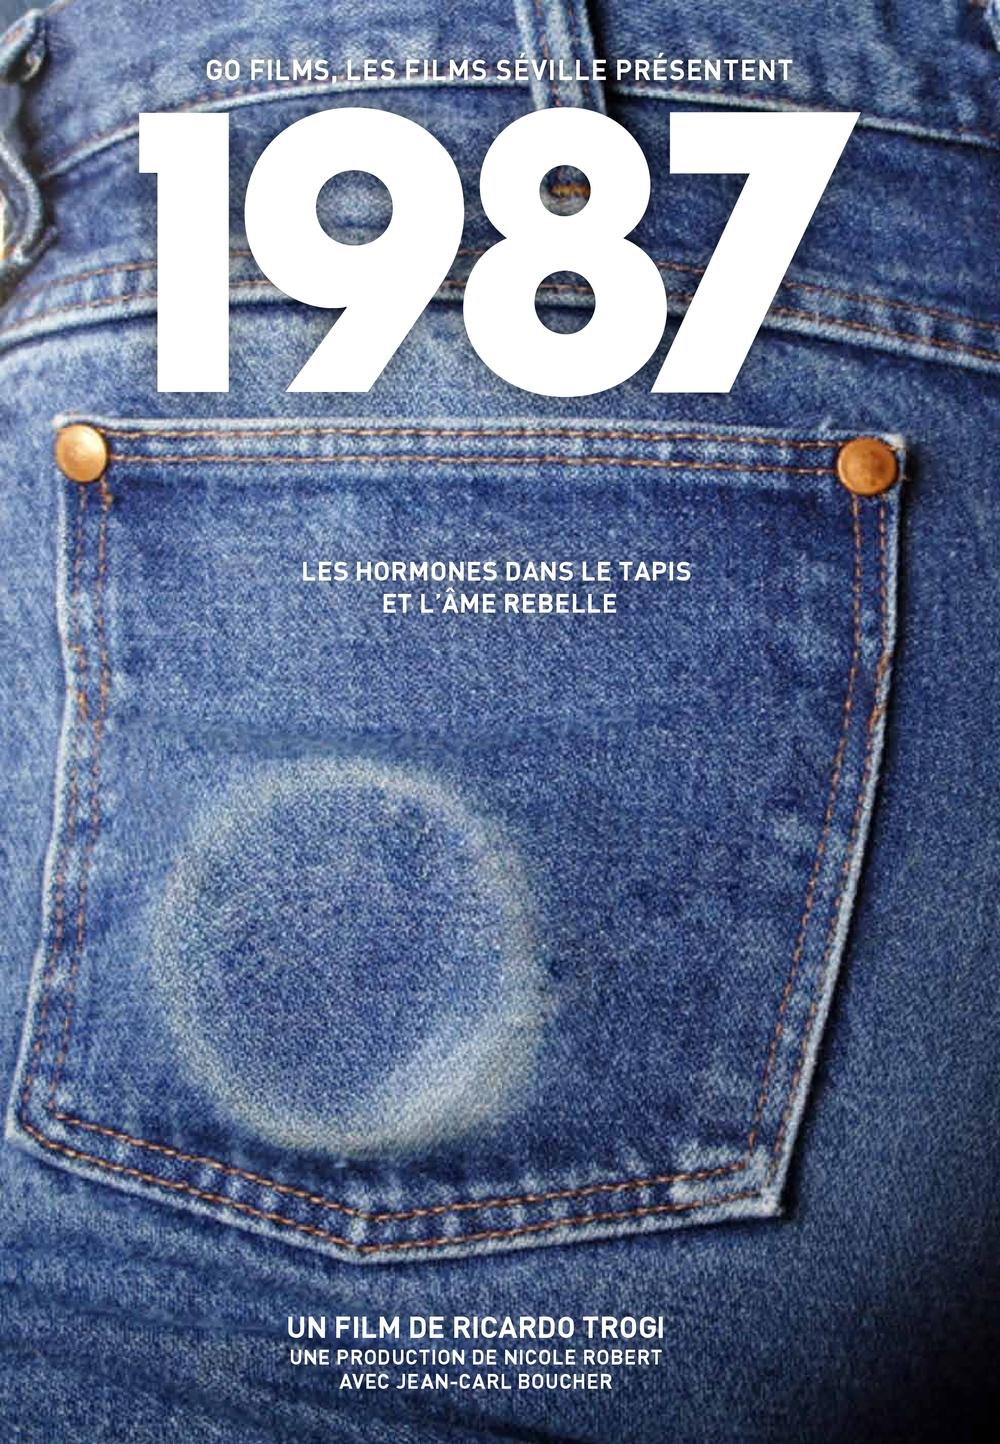 RENZO-1987-poster-concepts-31mars_00005.jpg